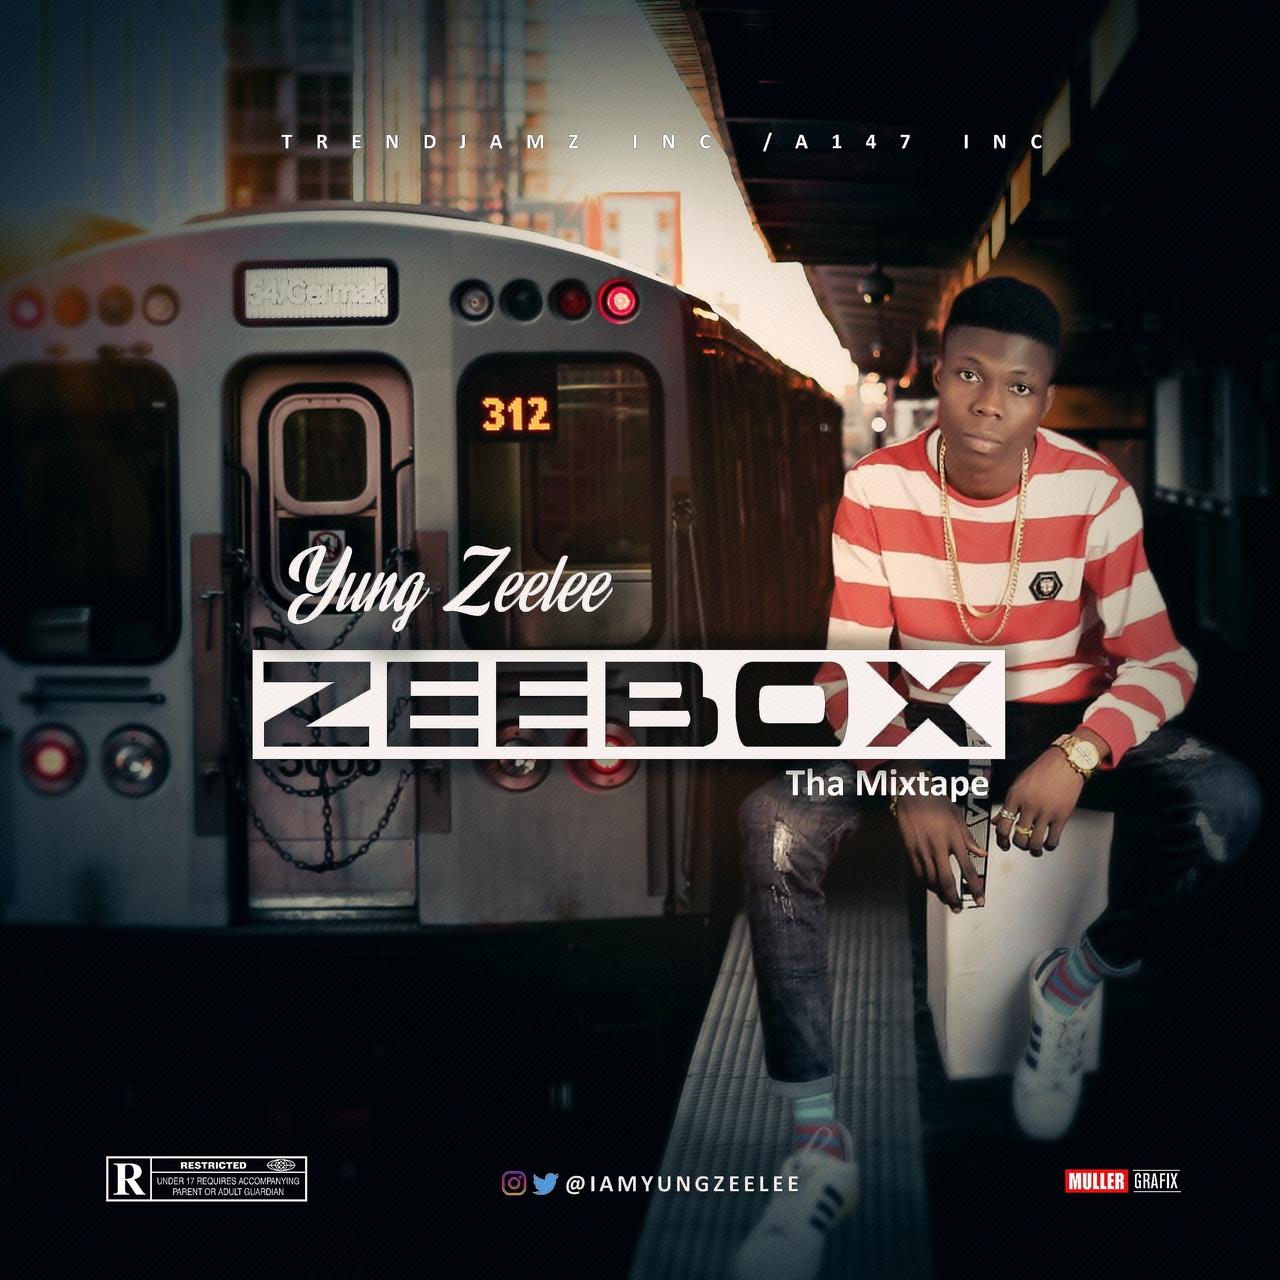 Yung Zeelee - ZeeBox (Tha Mixtape)